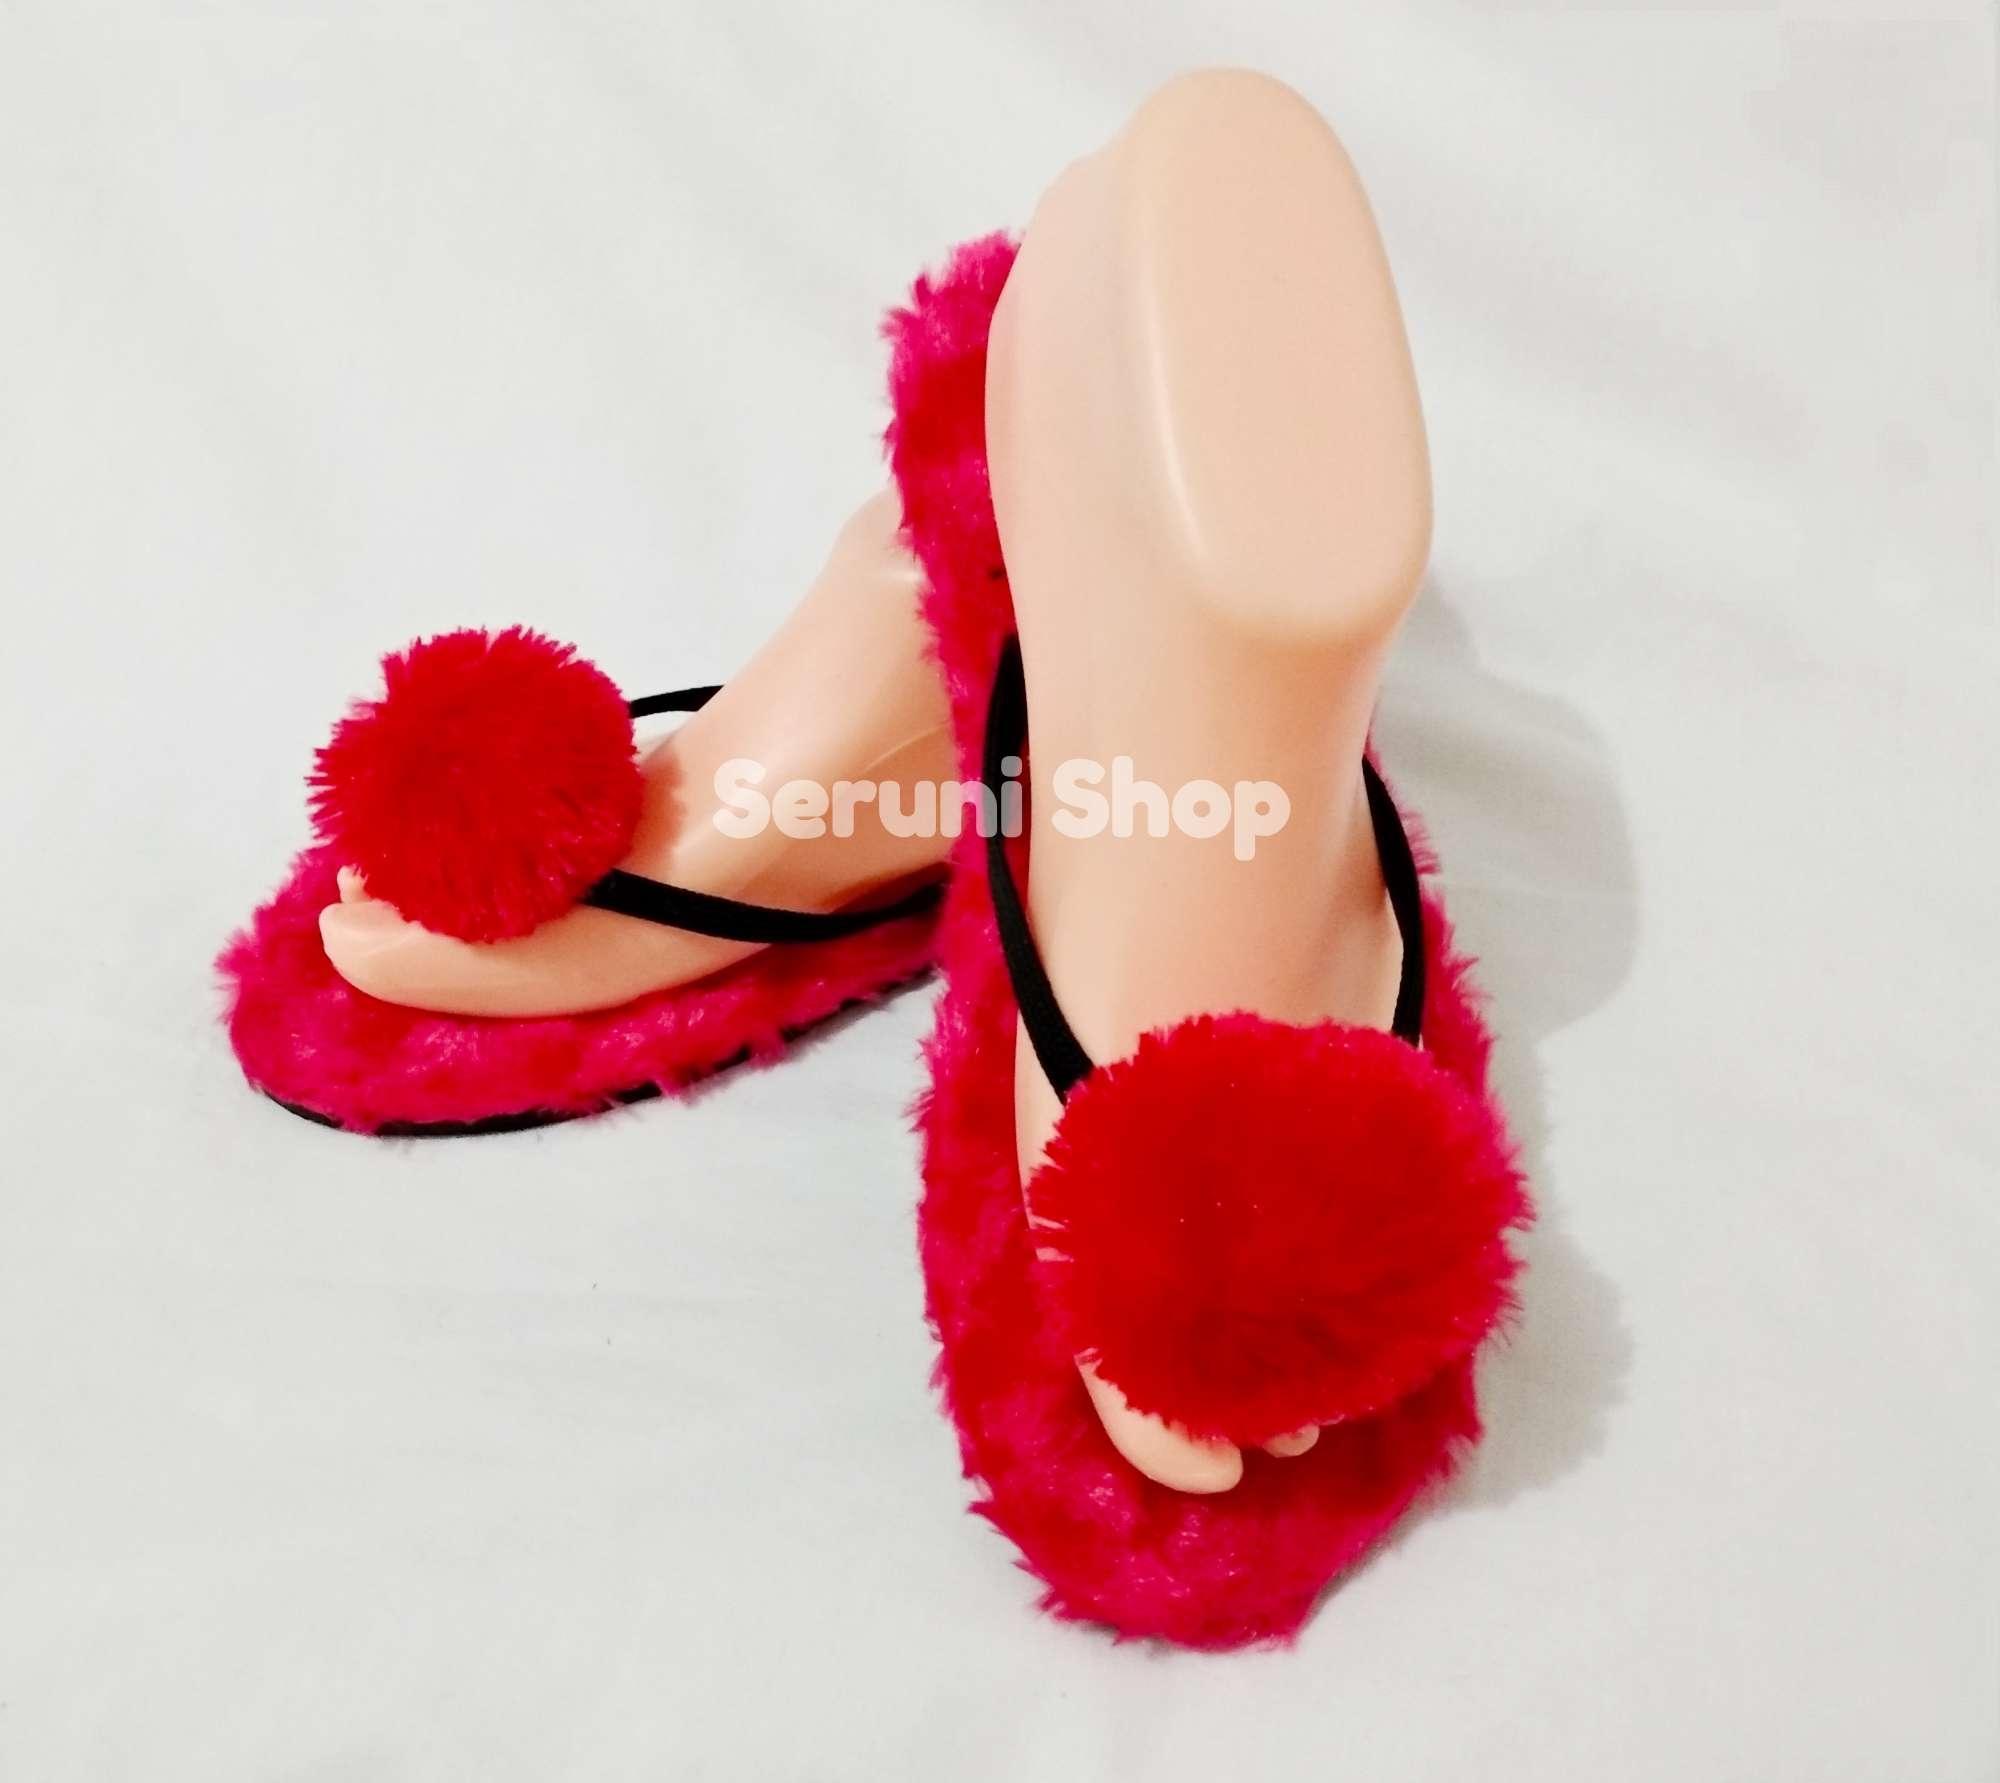 ... Seruni Flat Sandals Jepit Pom Pom Bulu Merah - 4